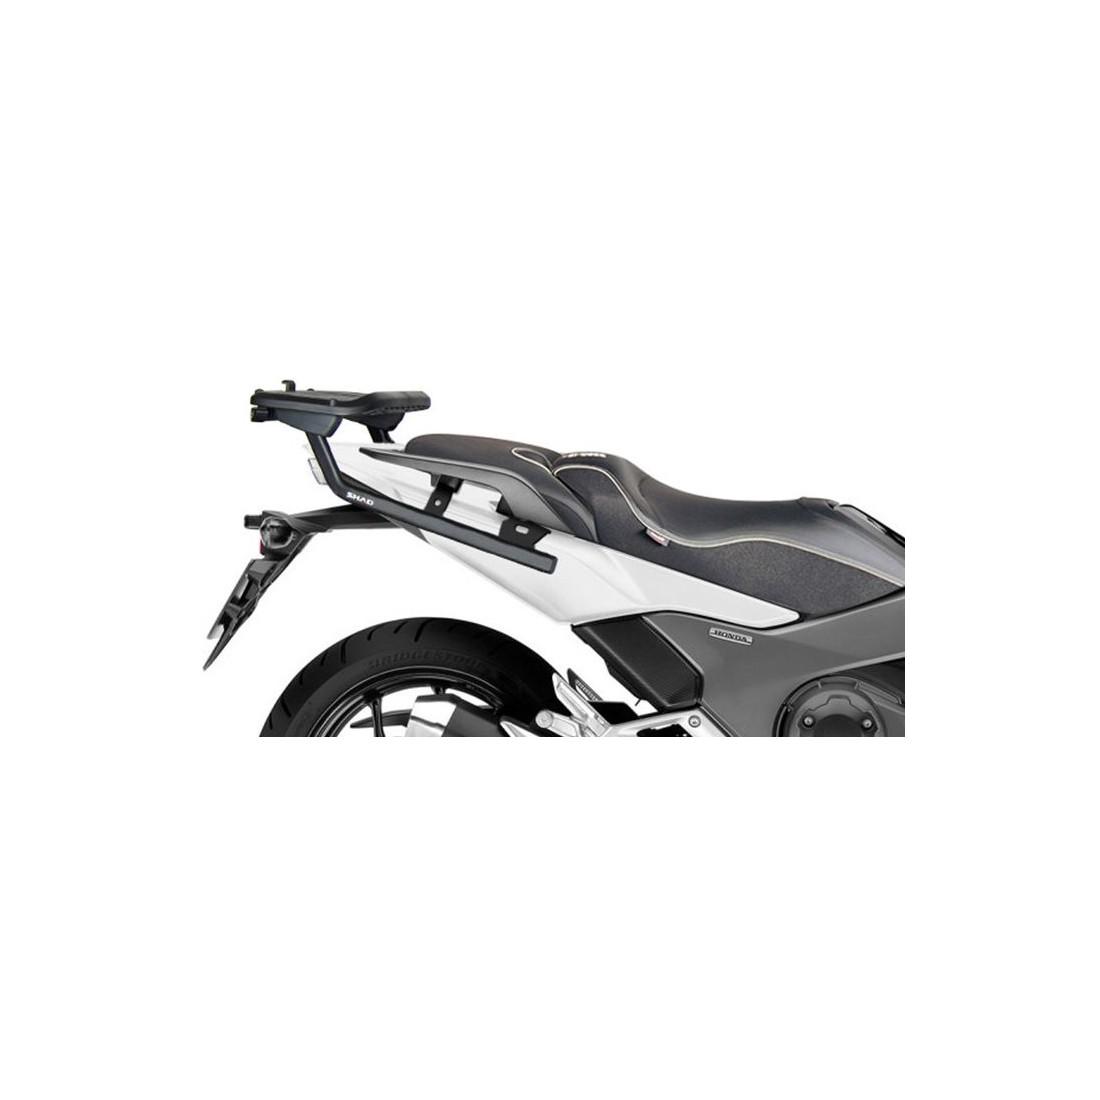 Fijación Top Master Shad Honda INTEGRA 750 16-18